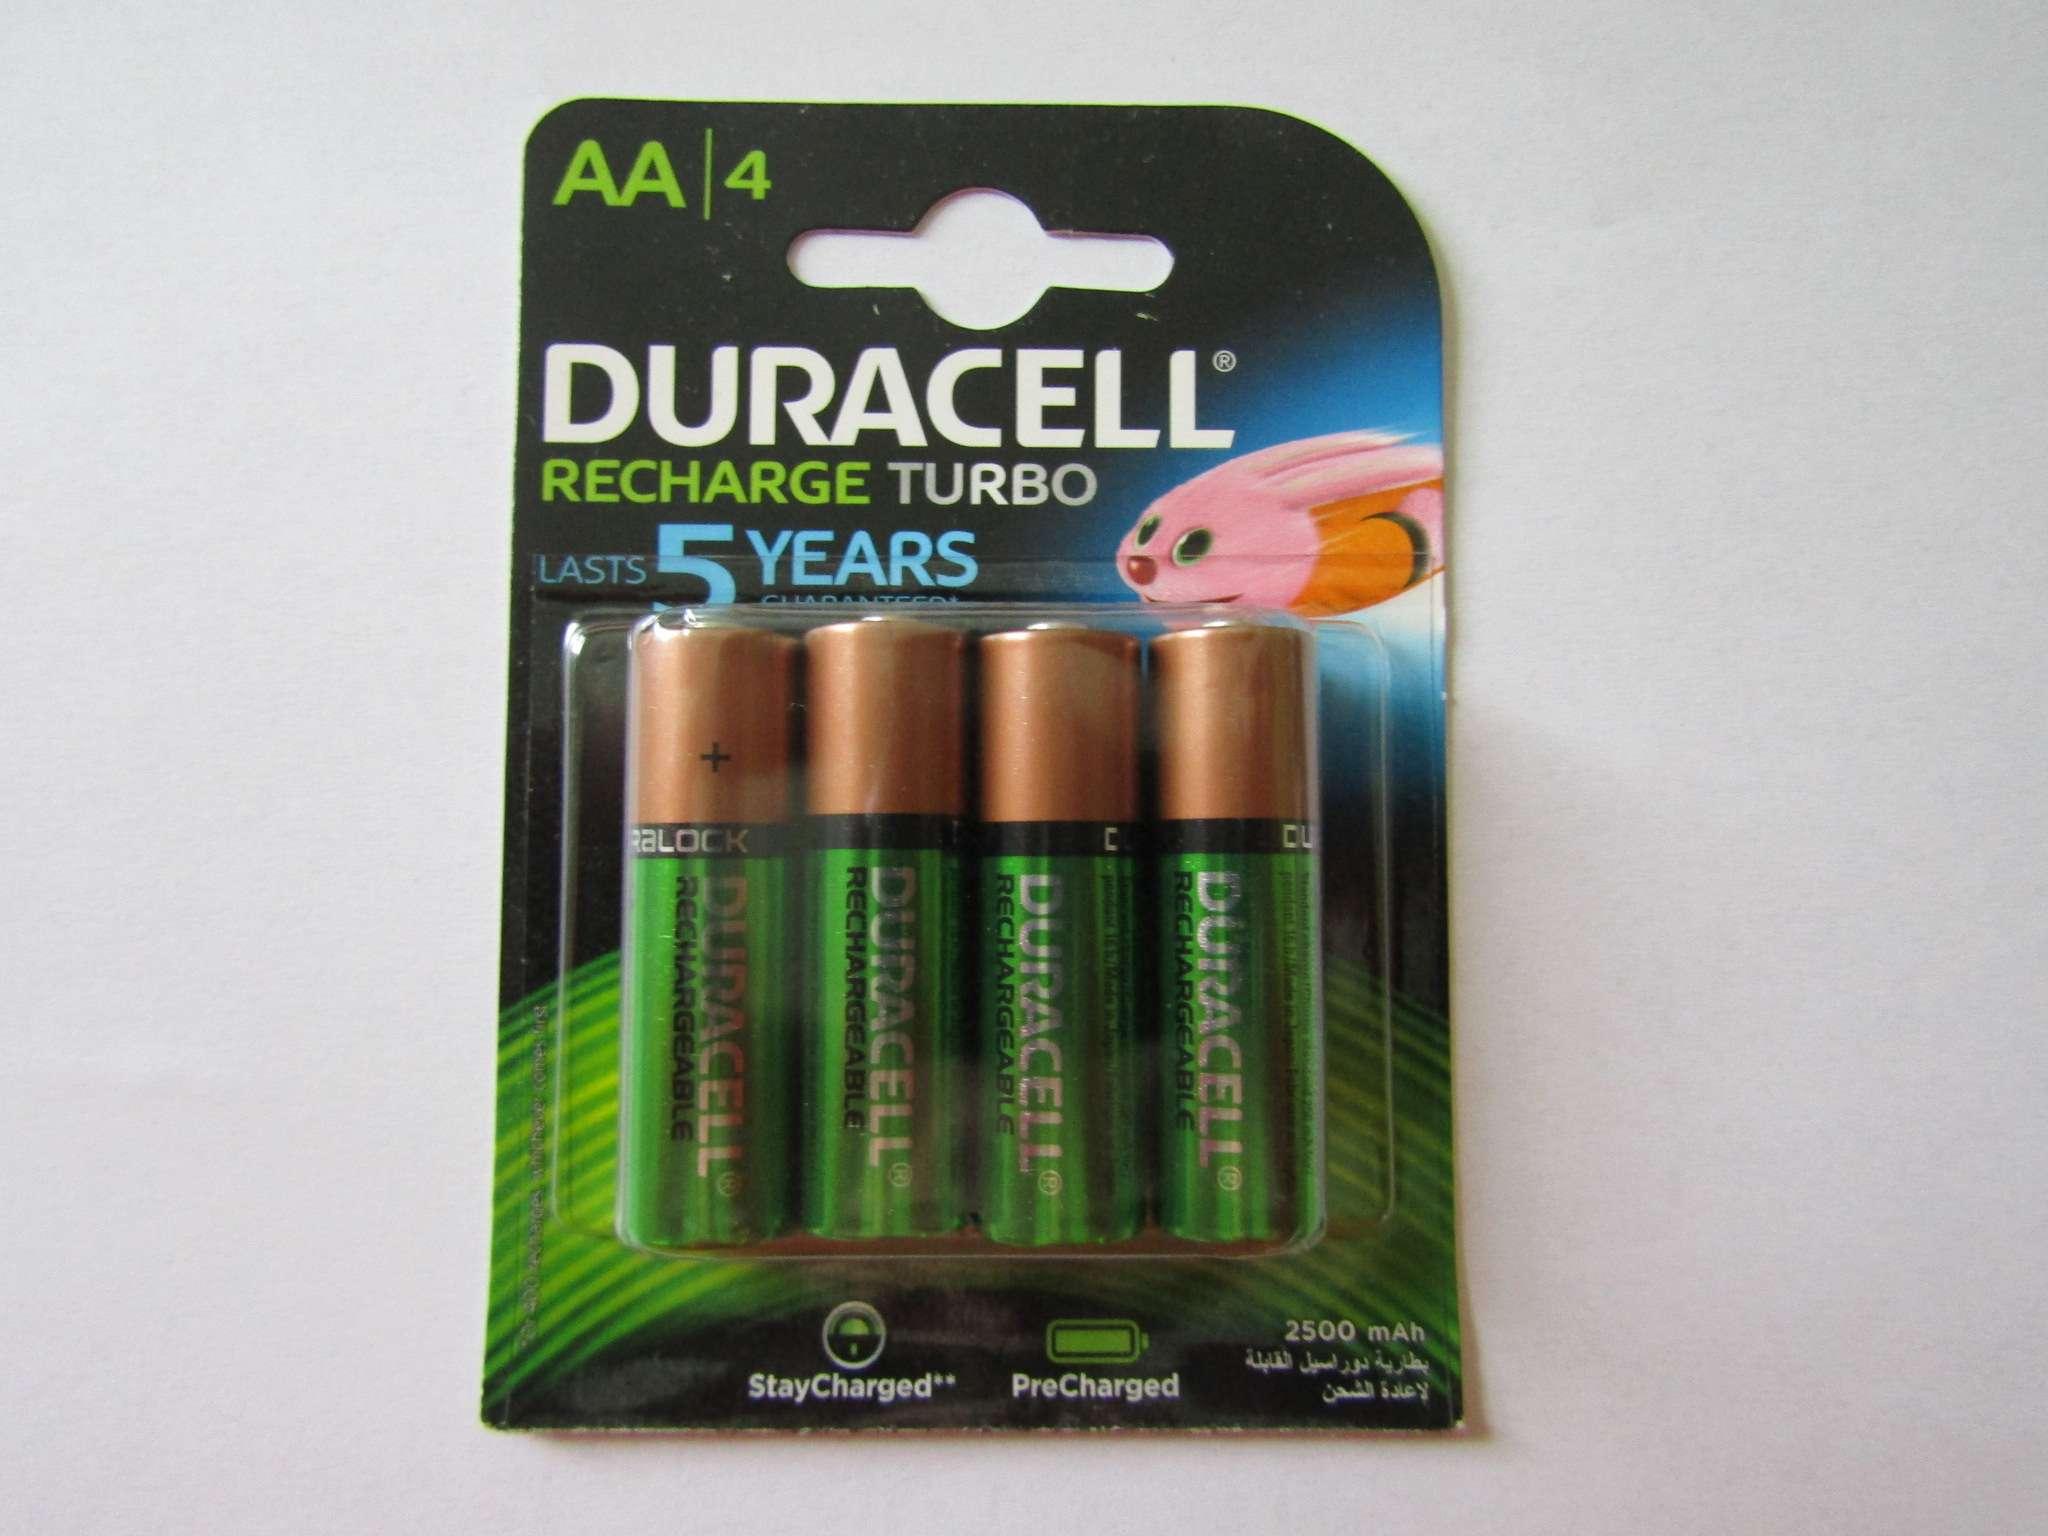 40x Aa 2500mah Nickel-hydrure Métallique Batterie Duracell Ar1543-afficher Le Titre D'origine Pxgjfaqq-07155330-746247052